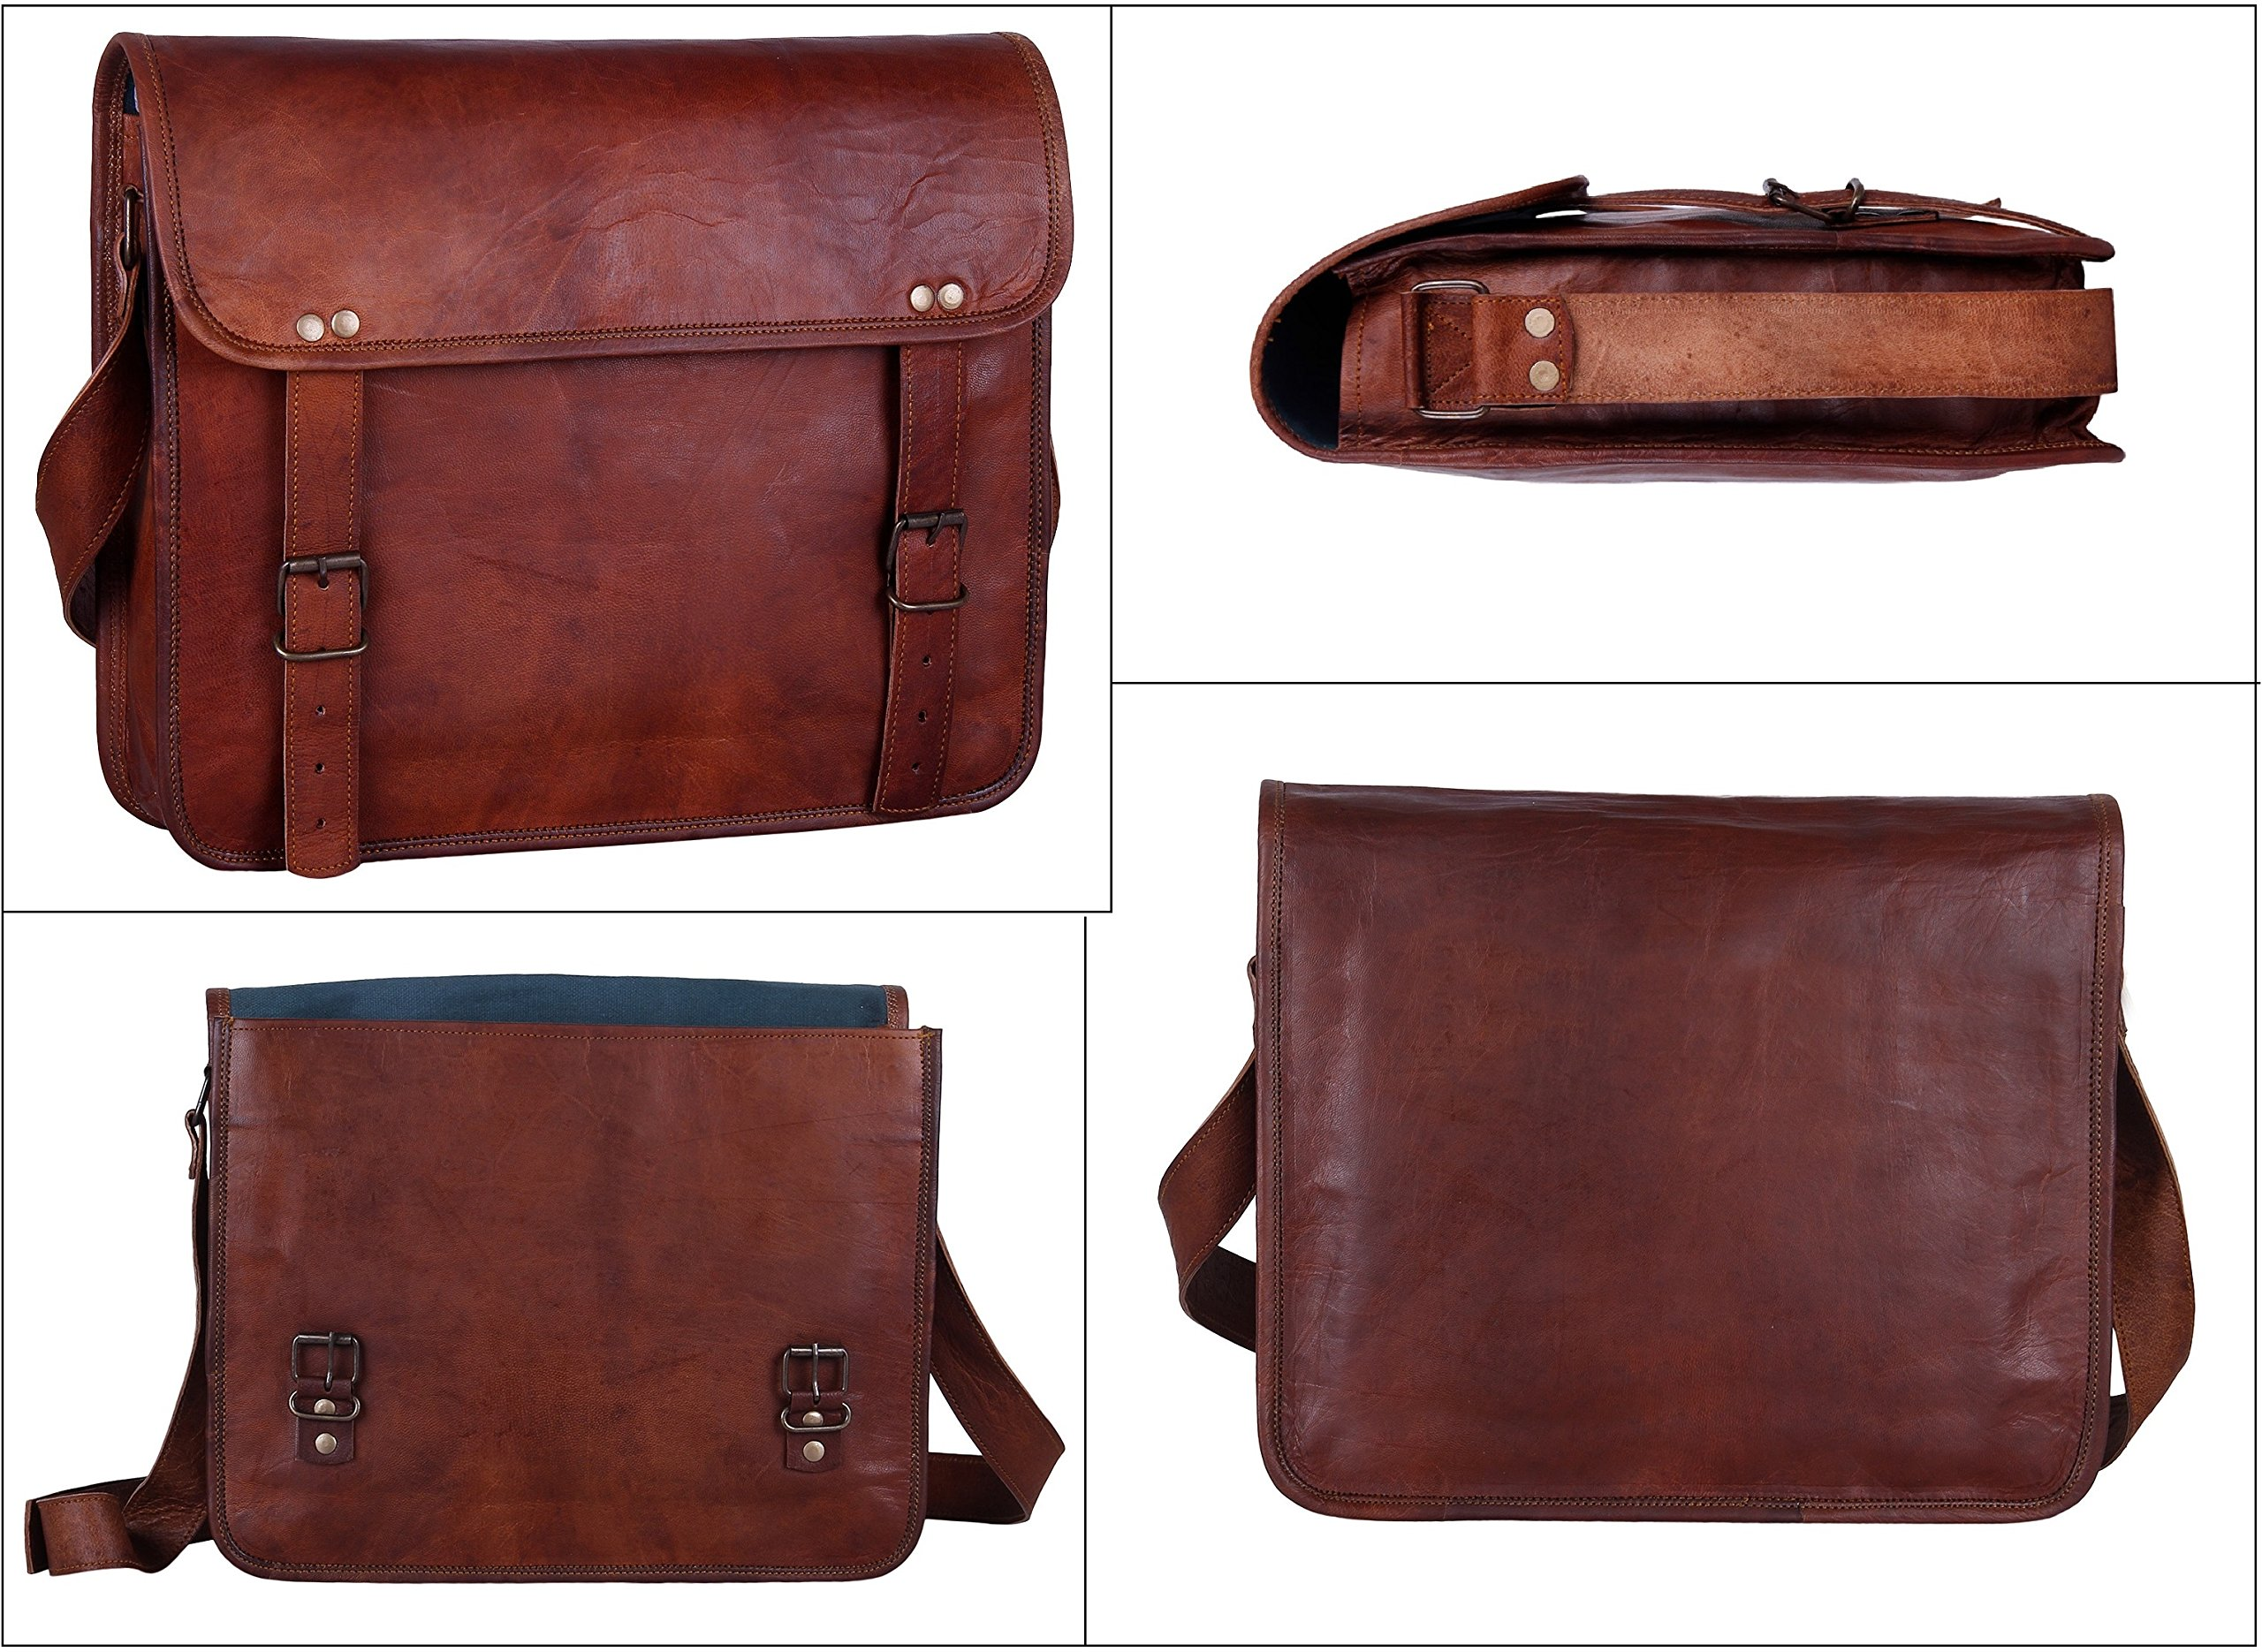 Rustic Town 15'' Genuine Leather Handmade Crossbody Messenger Satchel Laptop Bag by RusticTown (Image #5)